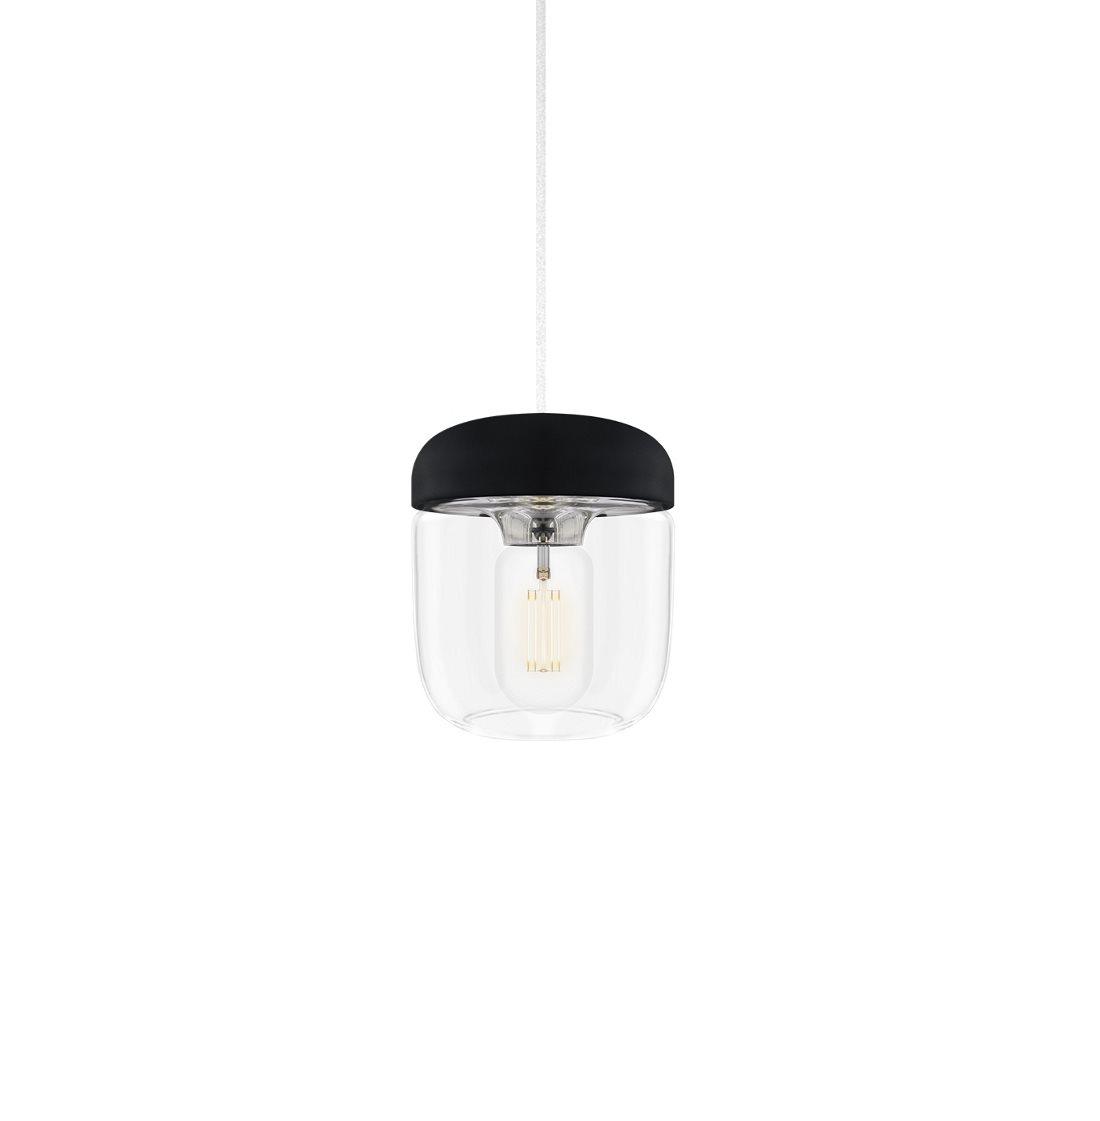 Acorn lampa black steel, VITA